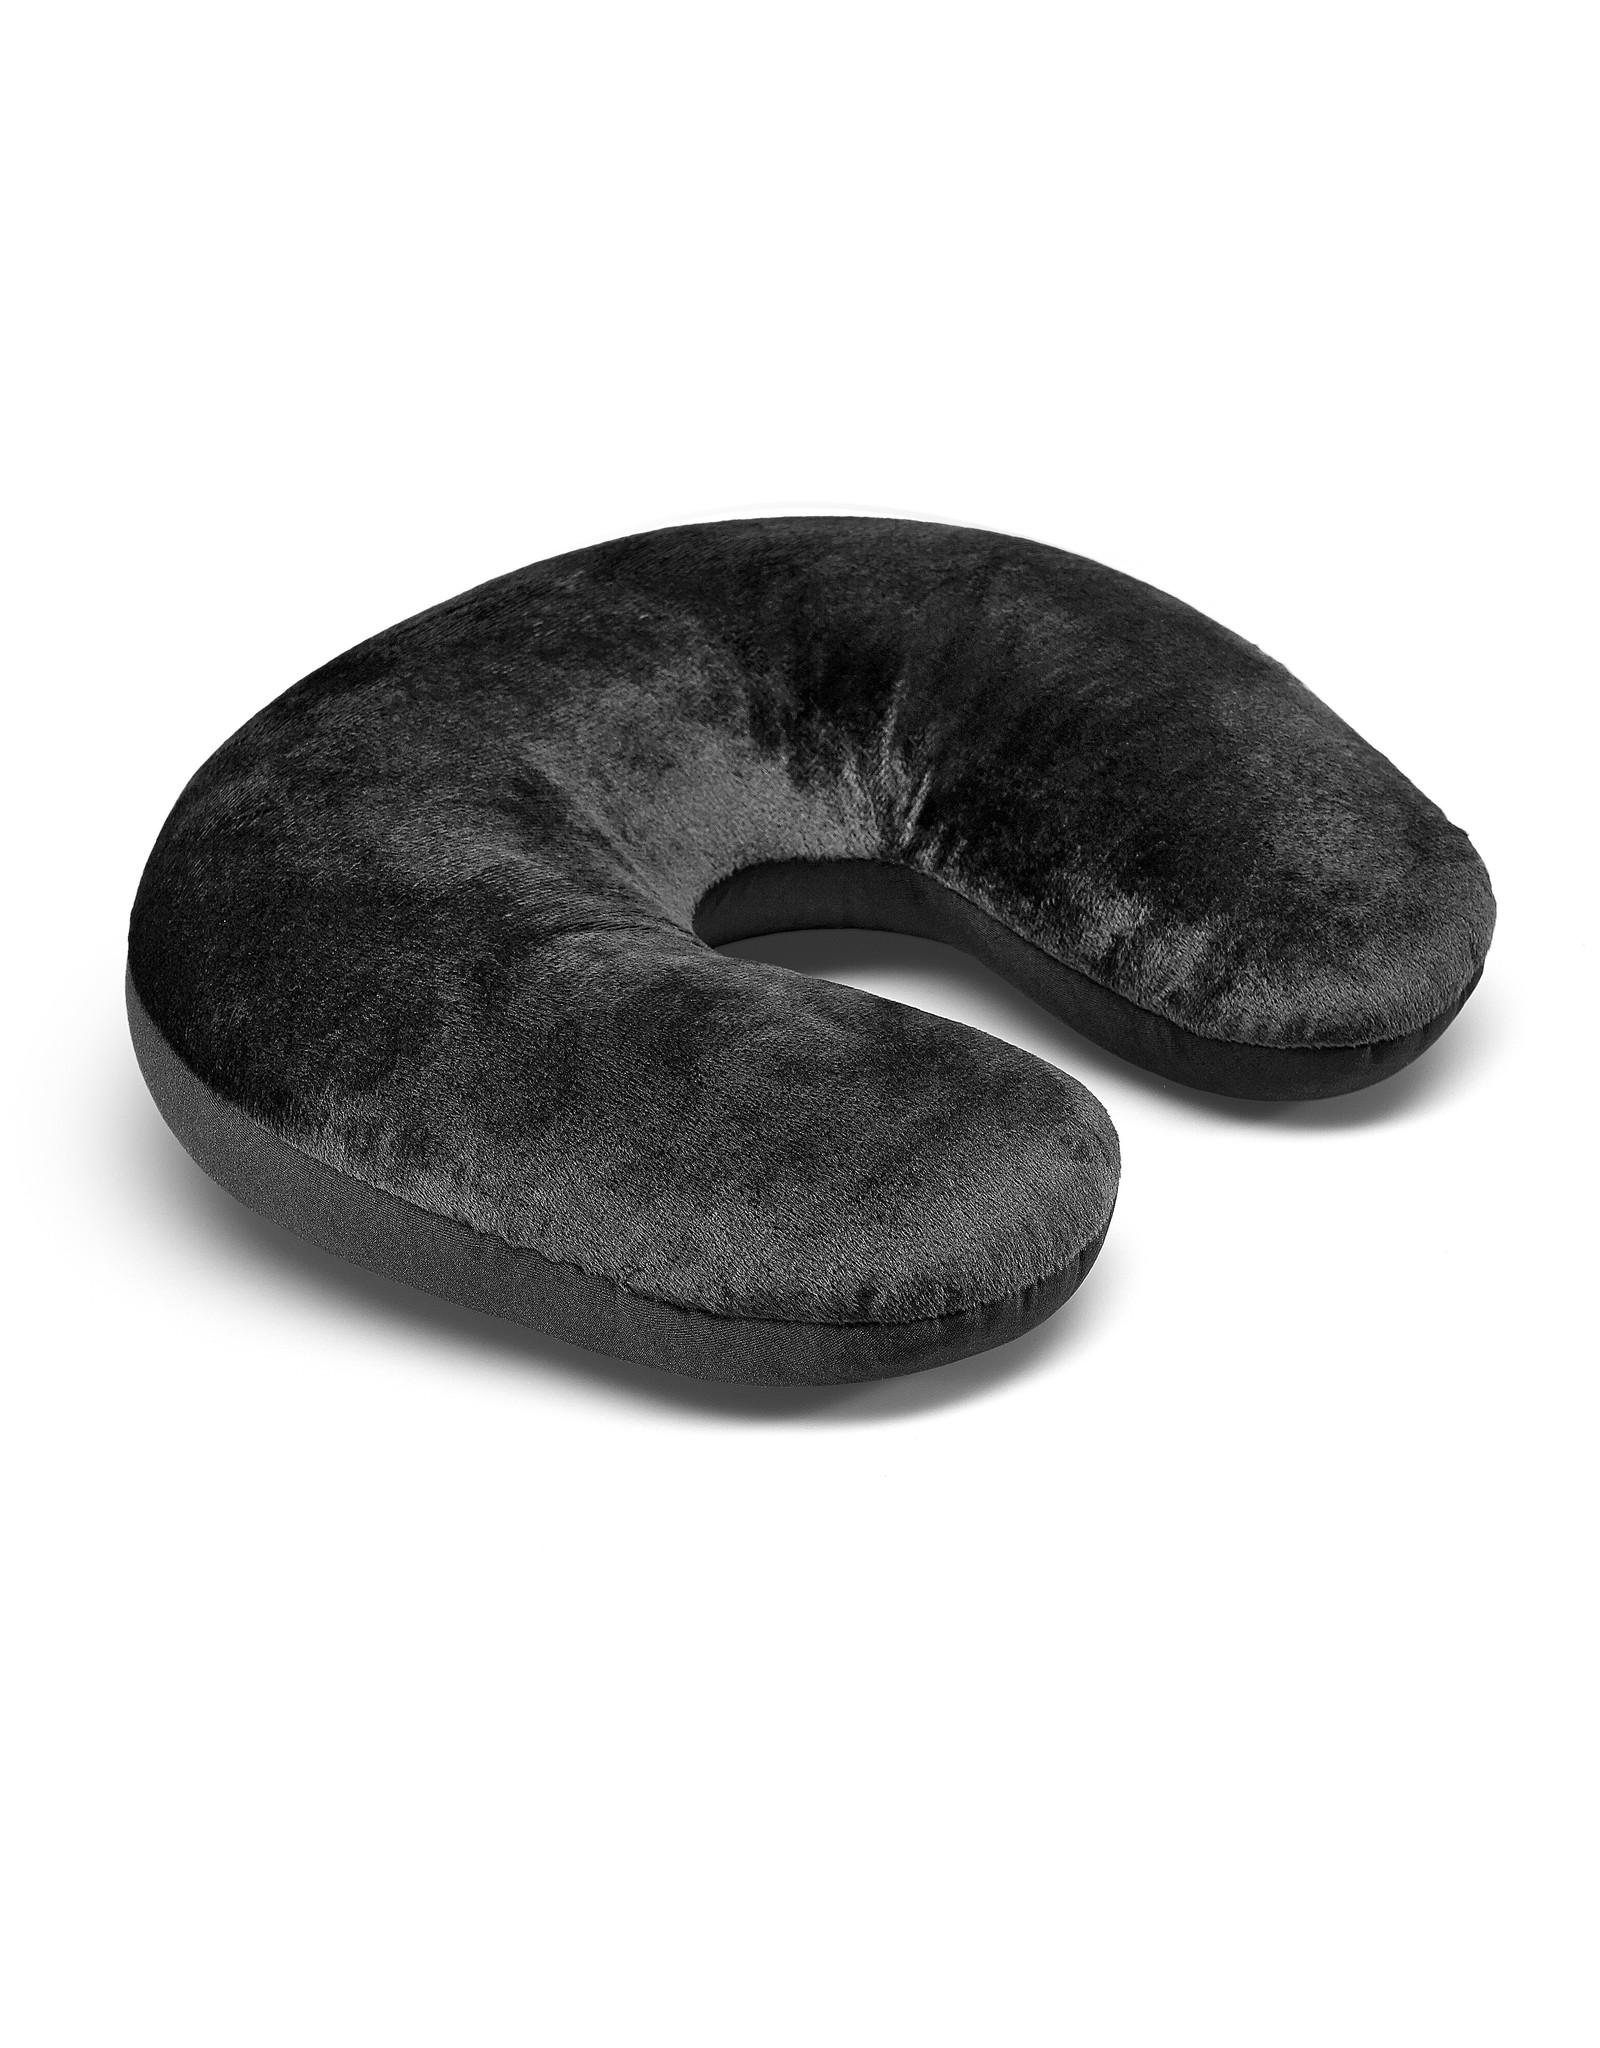 Kuschel-Maxx Kuschel-Maxx - Nack cushion Black ohne Knopf